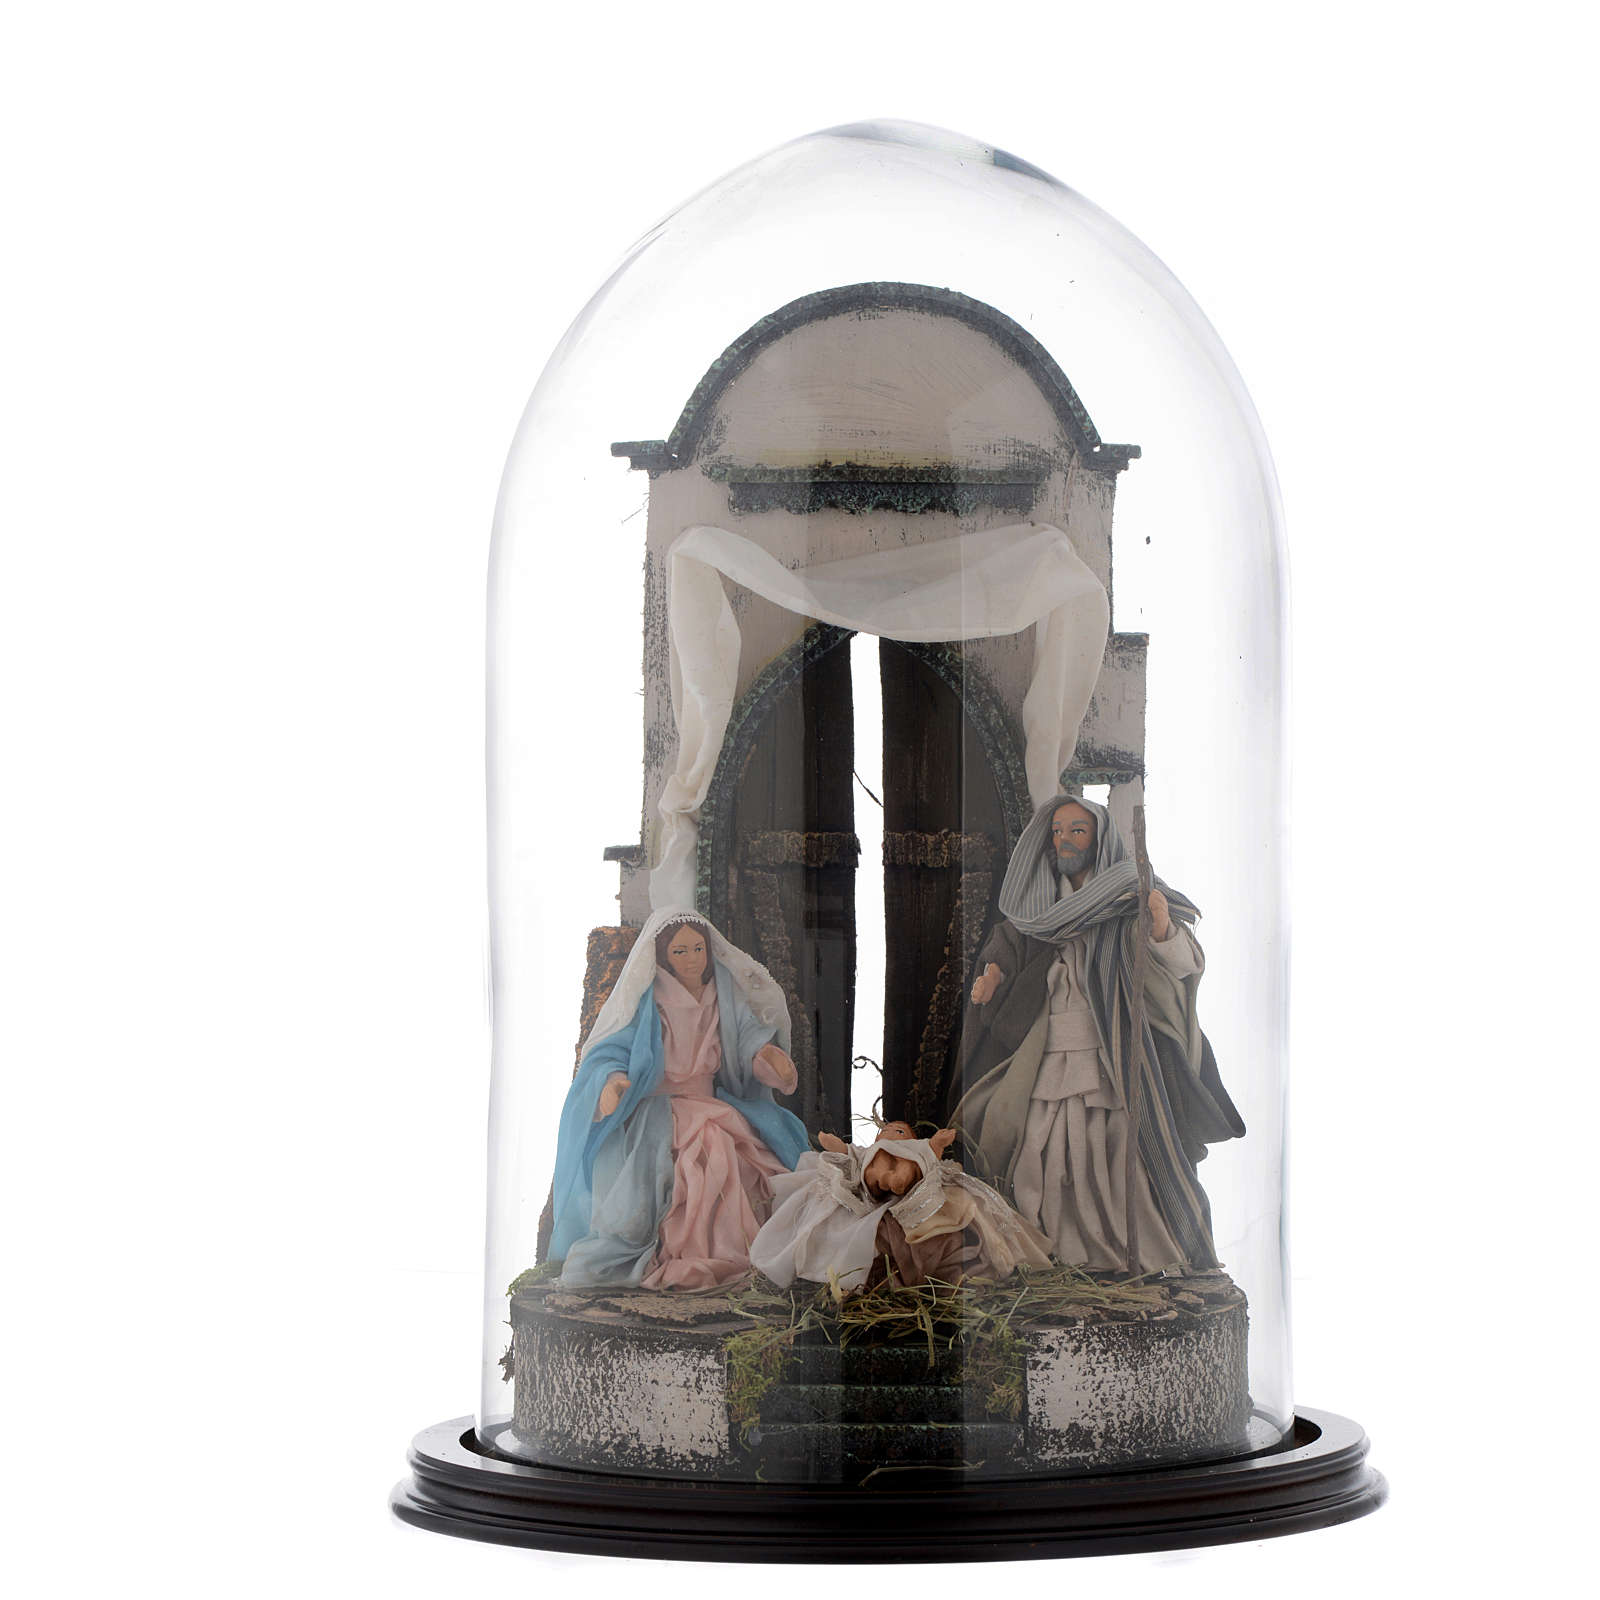 Sagrada Familia 45 x 30 cm campana vidrio belén Nápoles 4